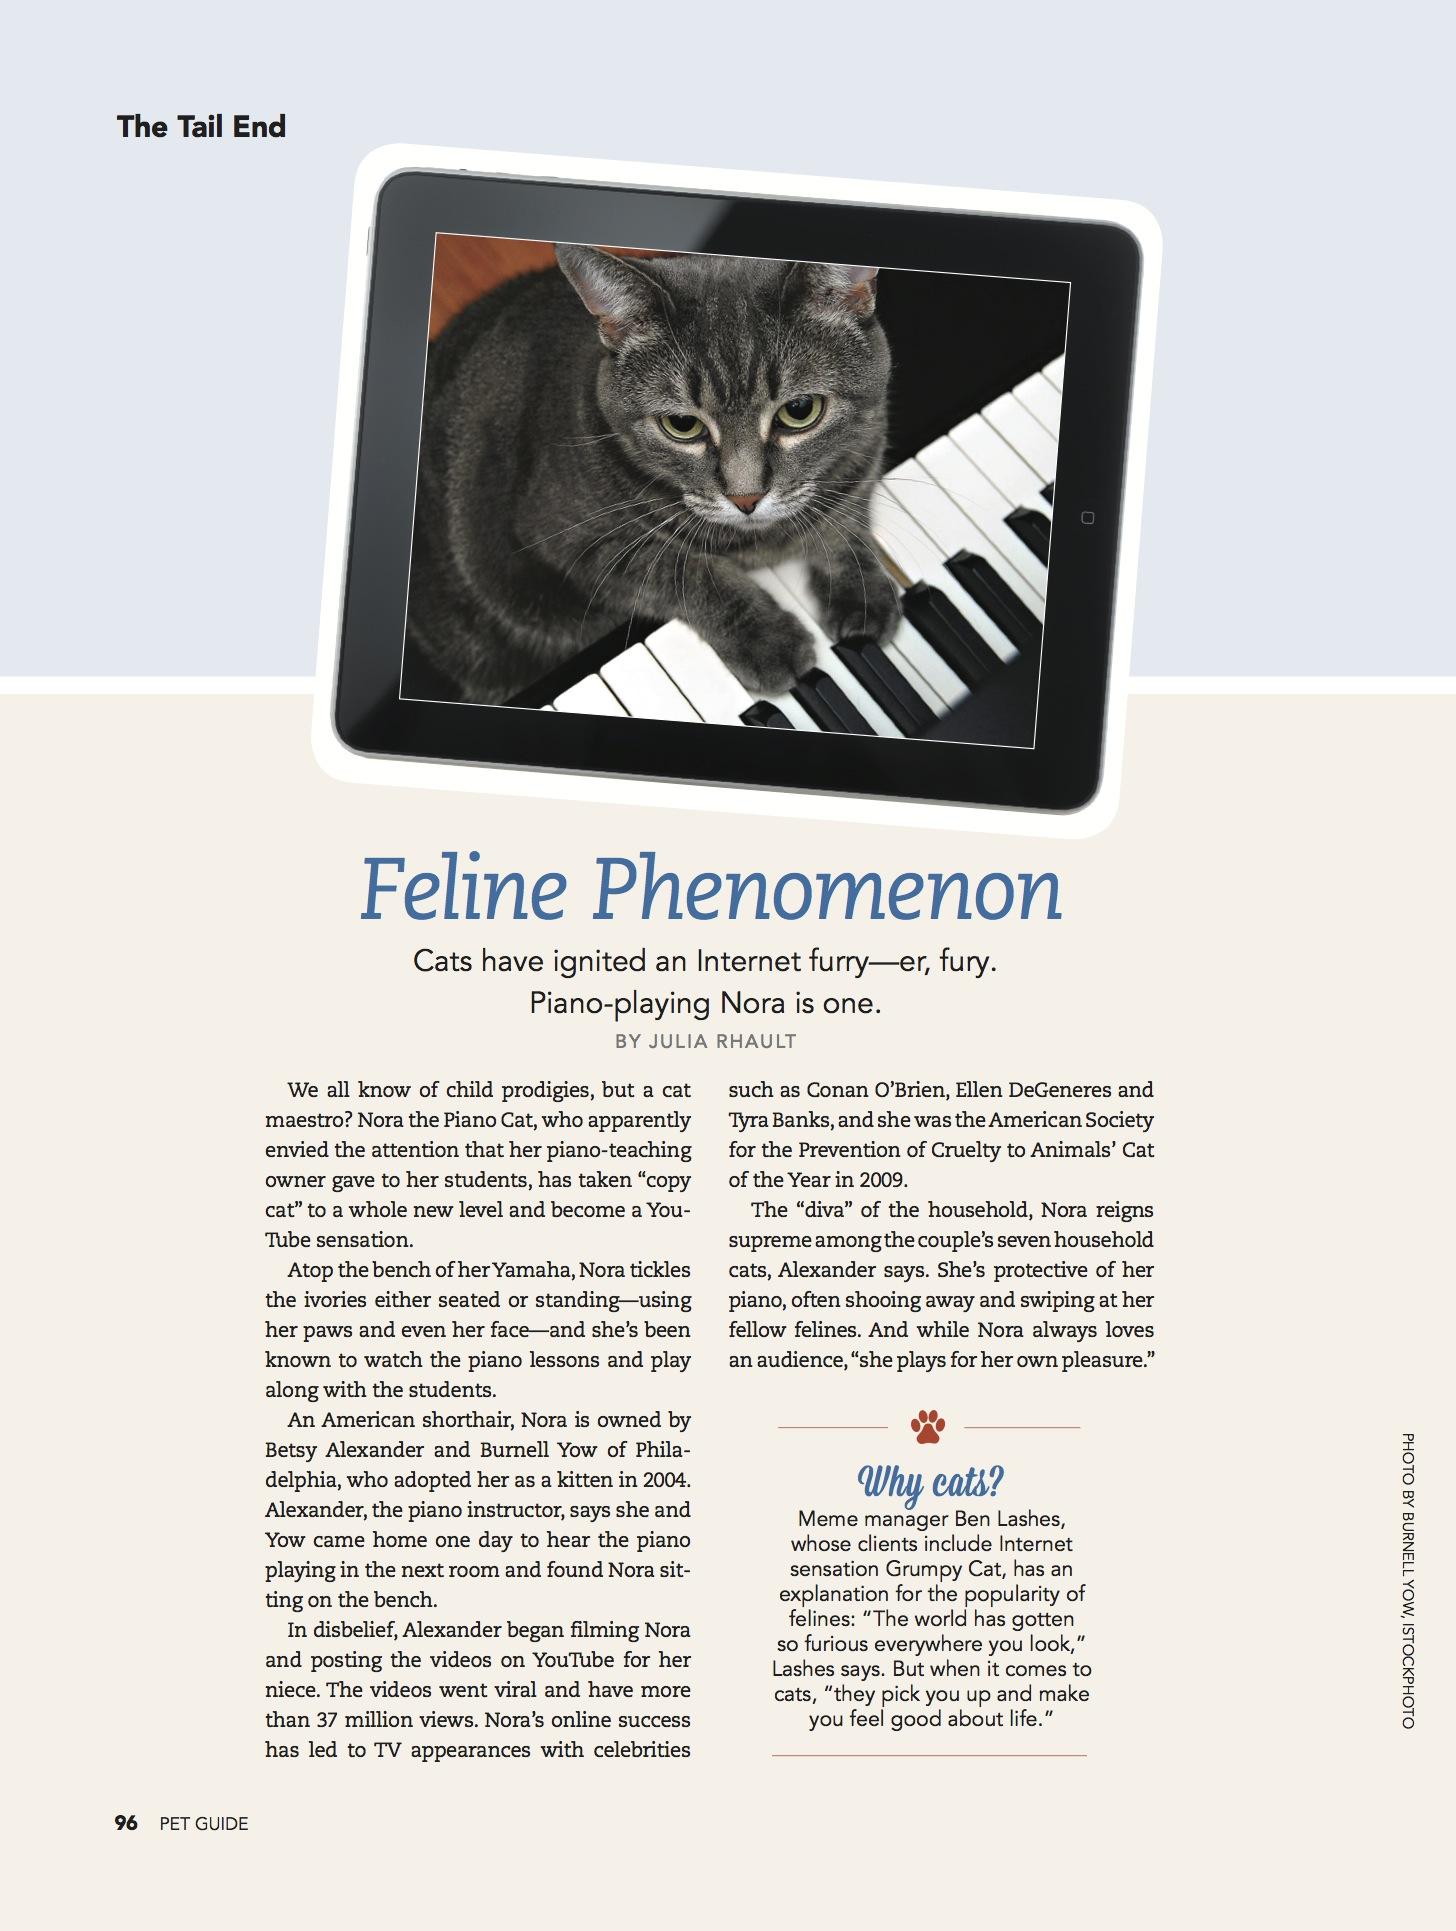 PET GUIDE_page96 Feline Phenomenon